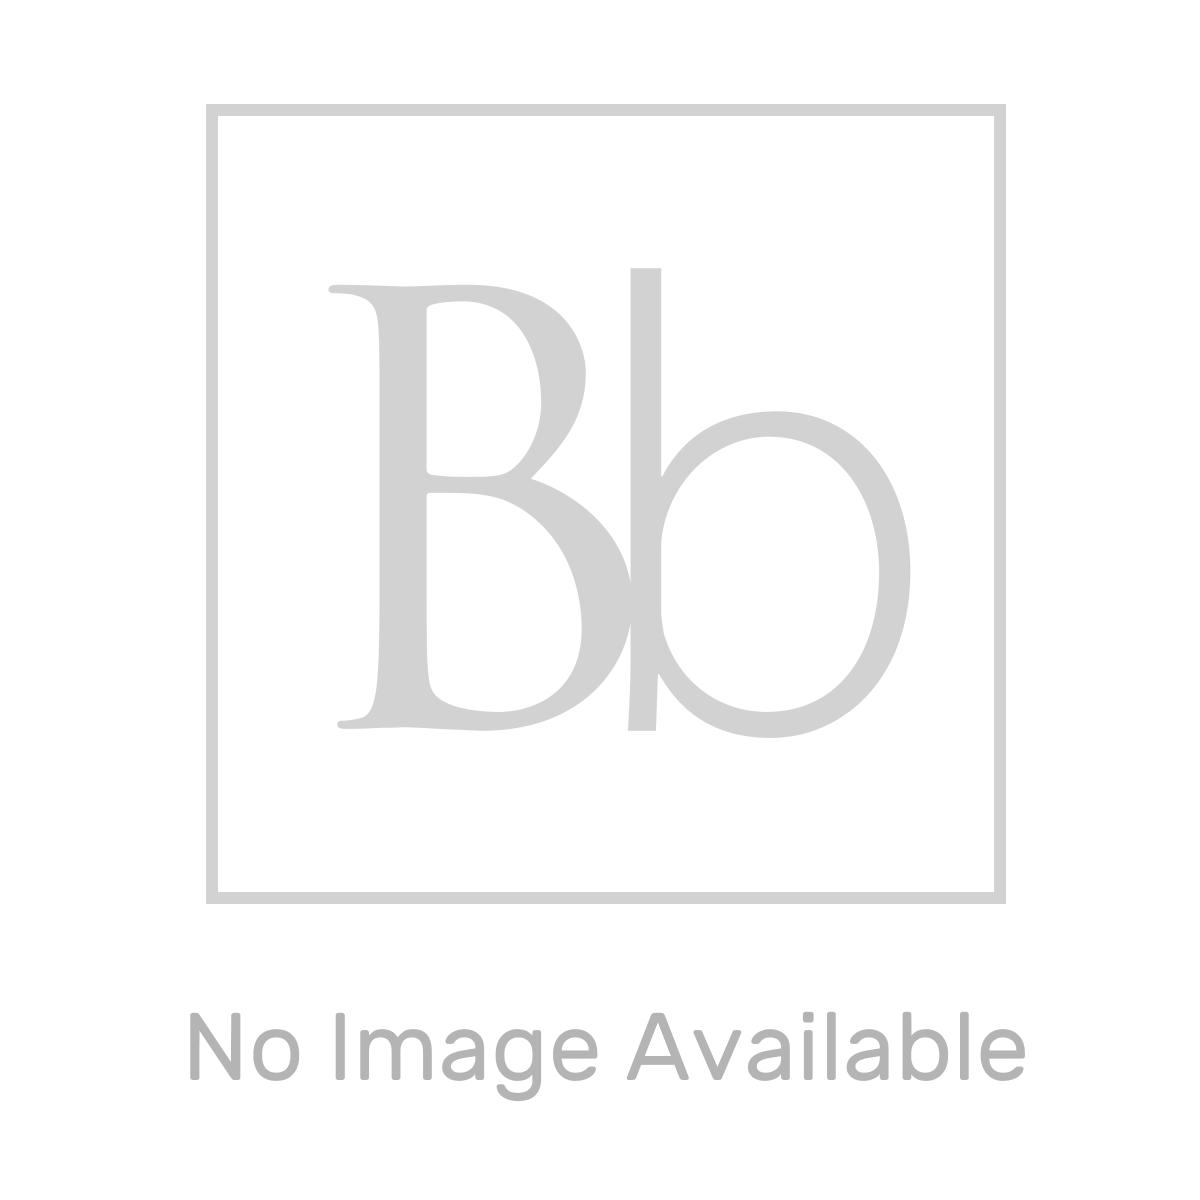 RAK Series 600 Short Projection Toilet 600mm Dimensions